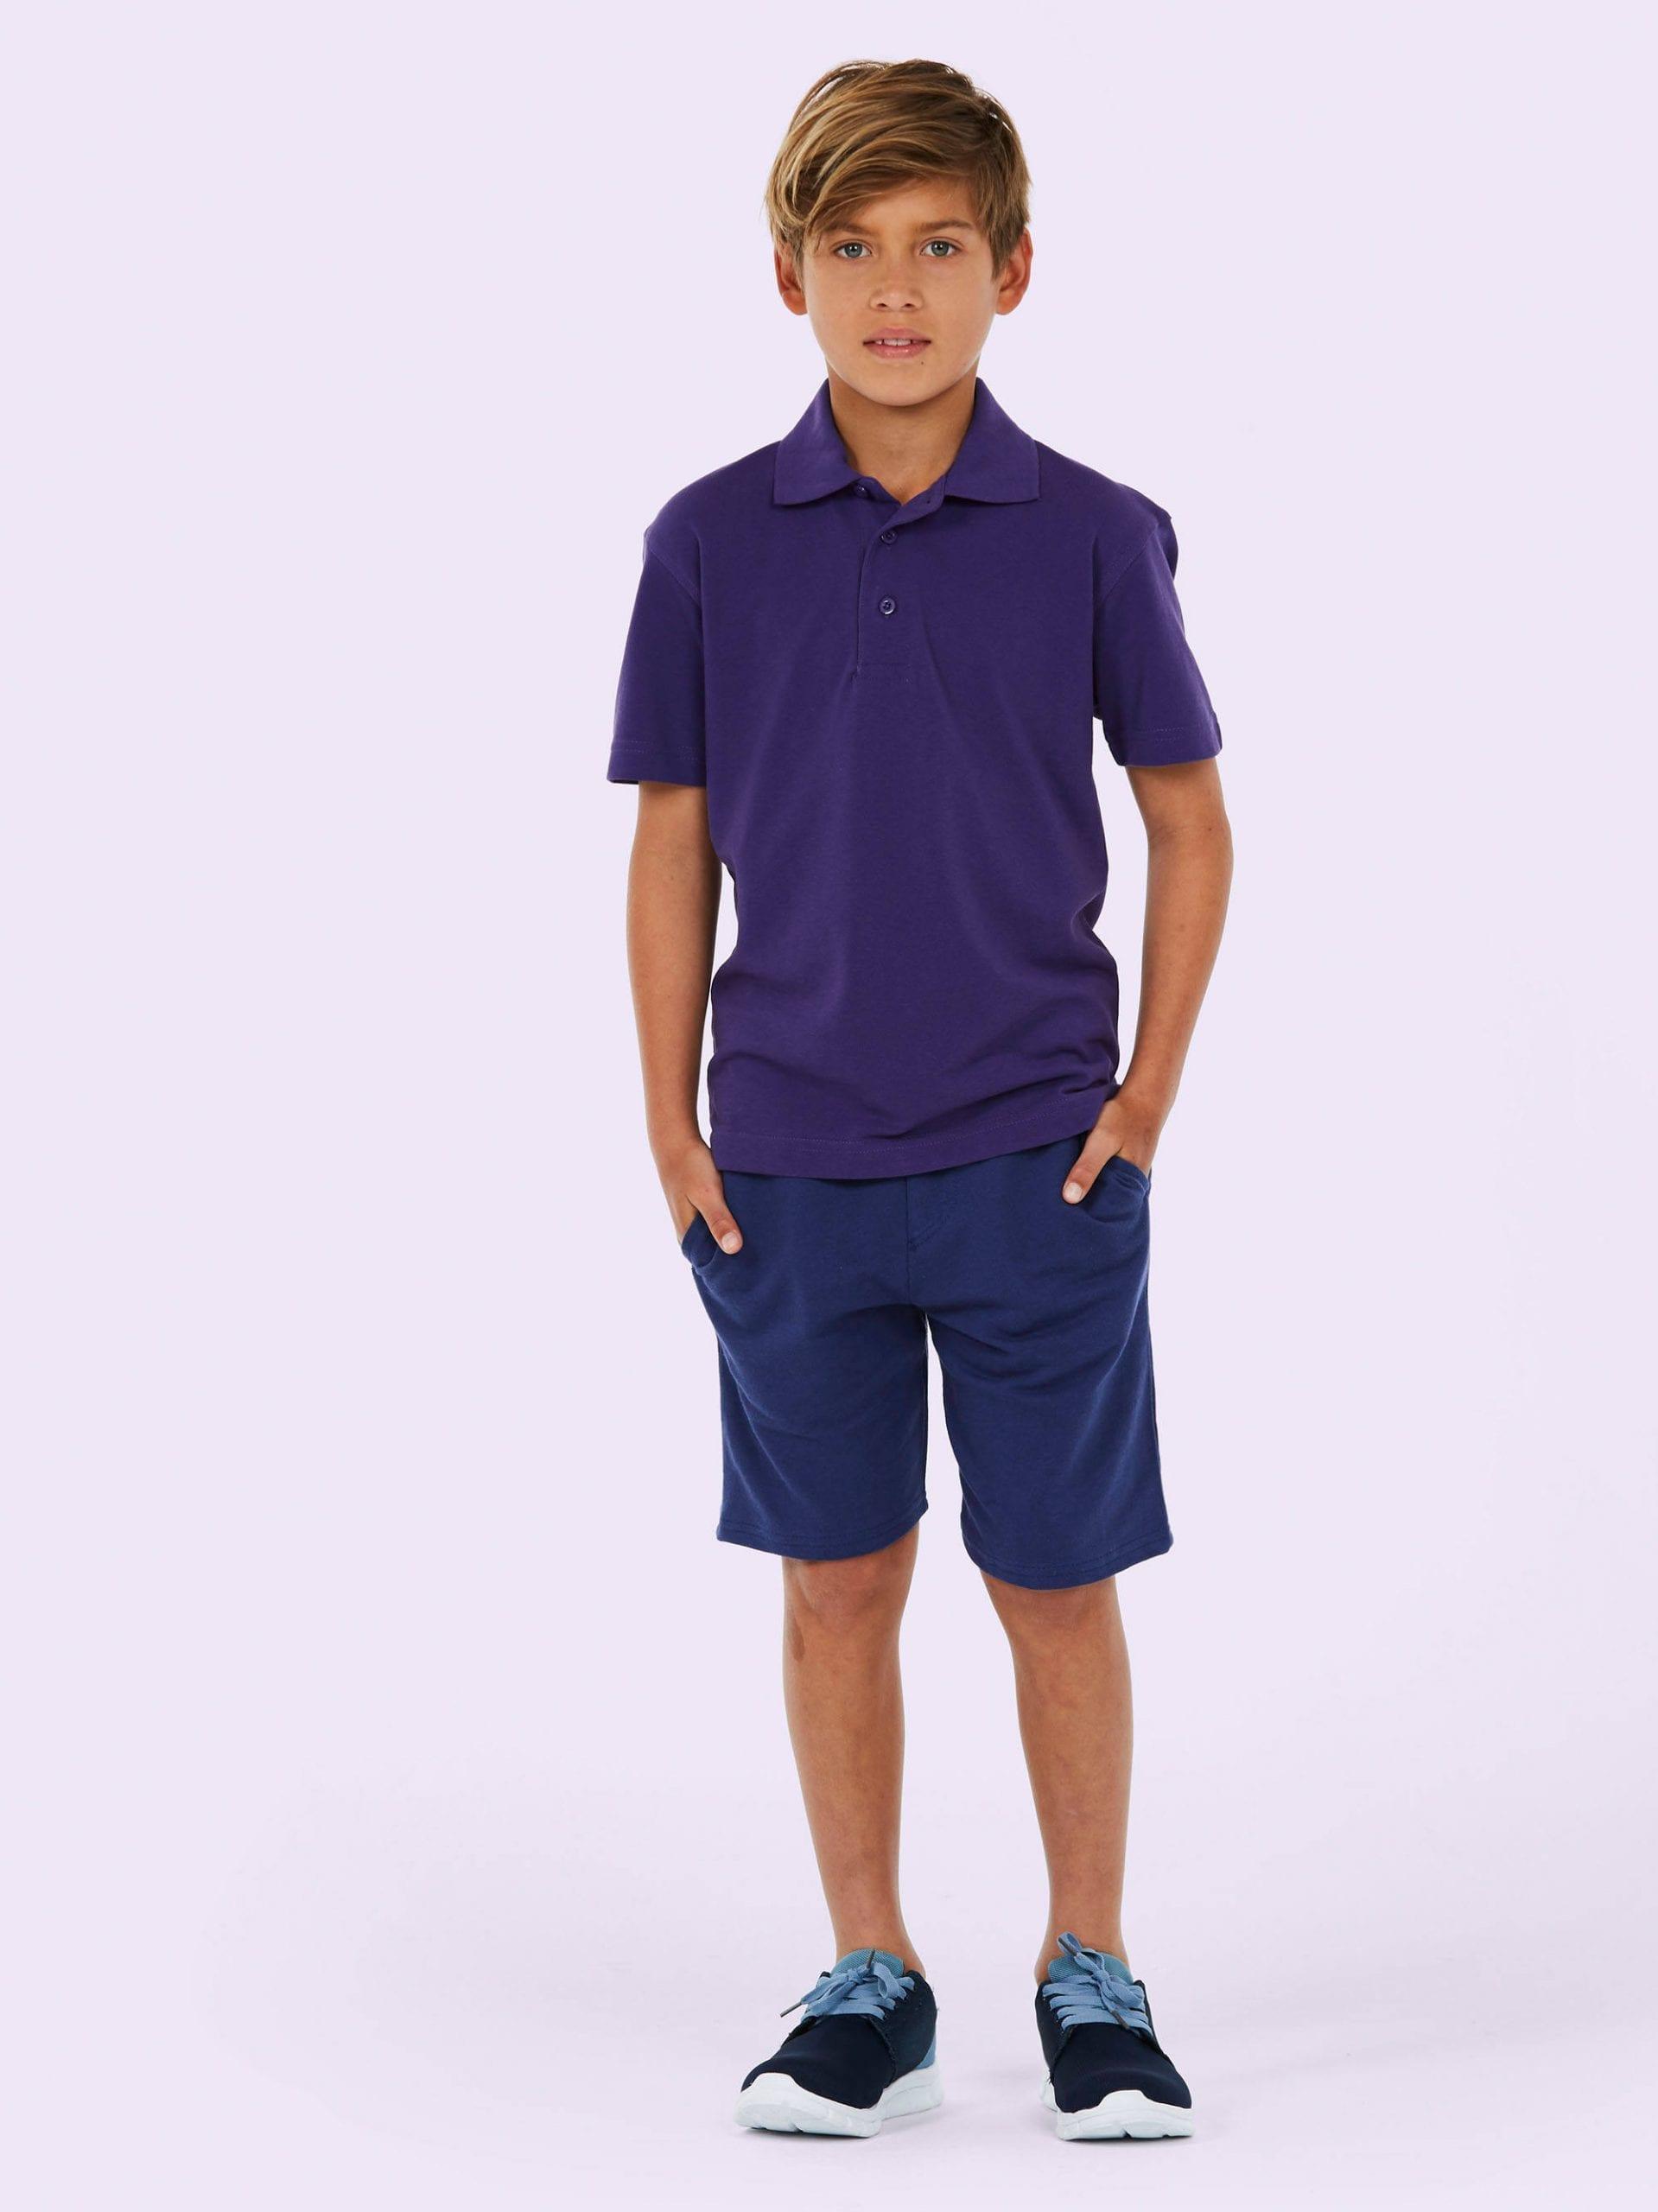 Children's Polo shirt - Unisex